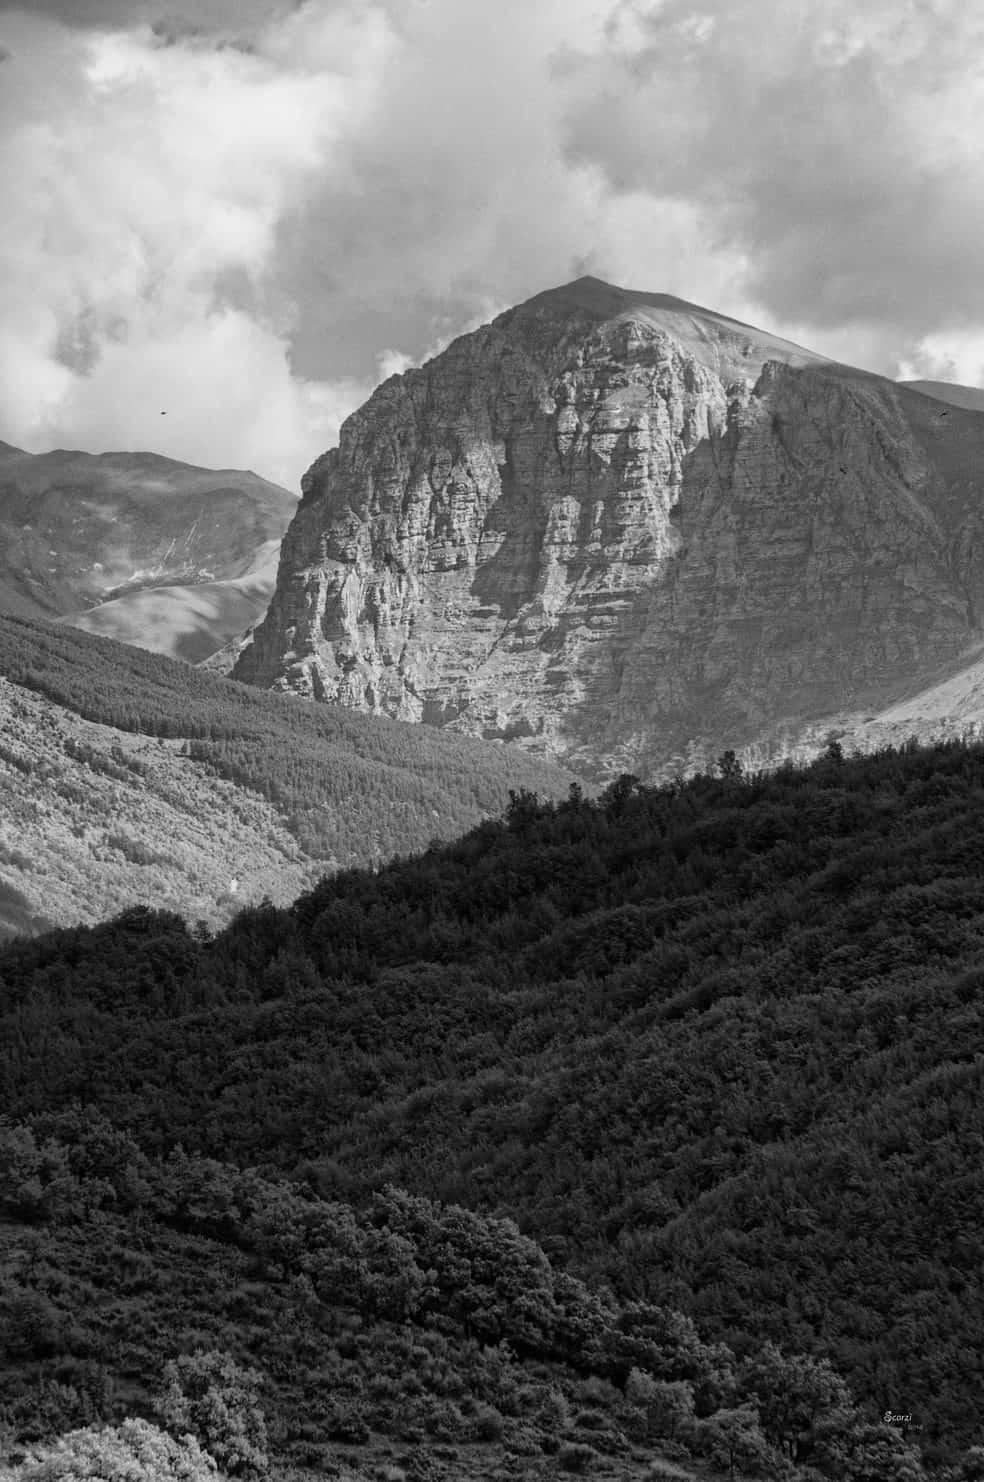 Monte Bove da Massaprofoglio a